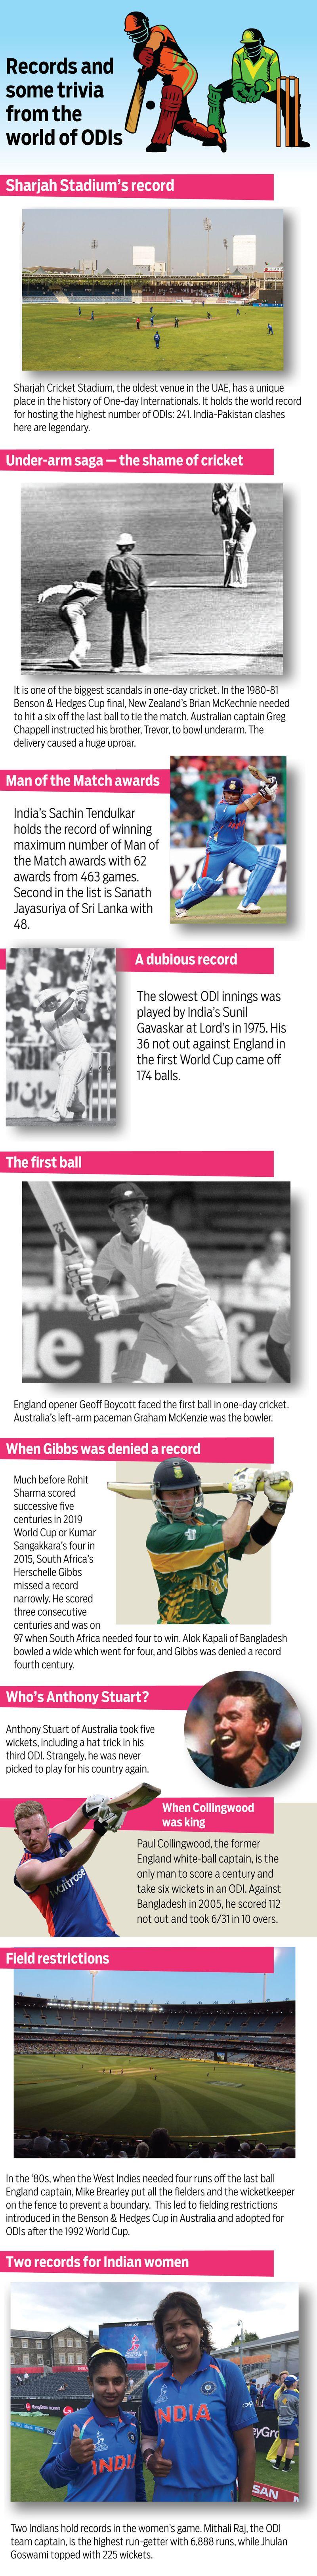 ODI cricket trivia corrected